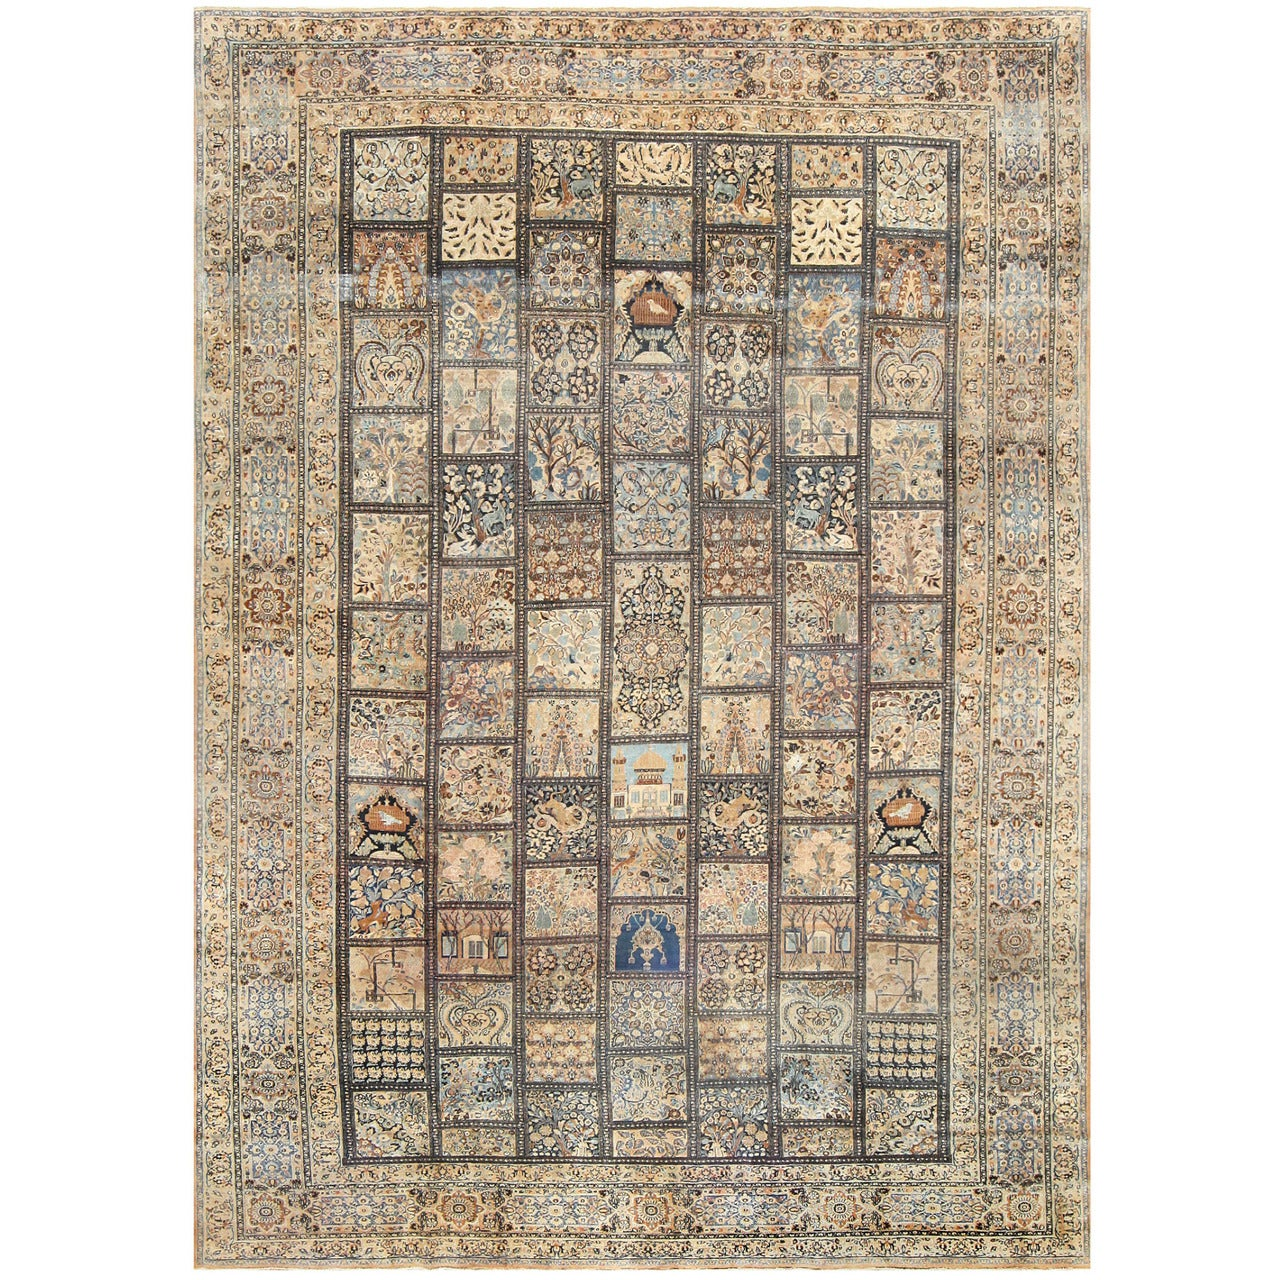 Antique Persian Khorassan Garden Design Carpet. Size: 10 ft 8 in x 15 ft 1 in